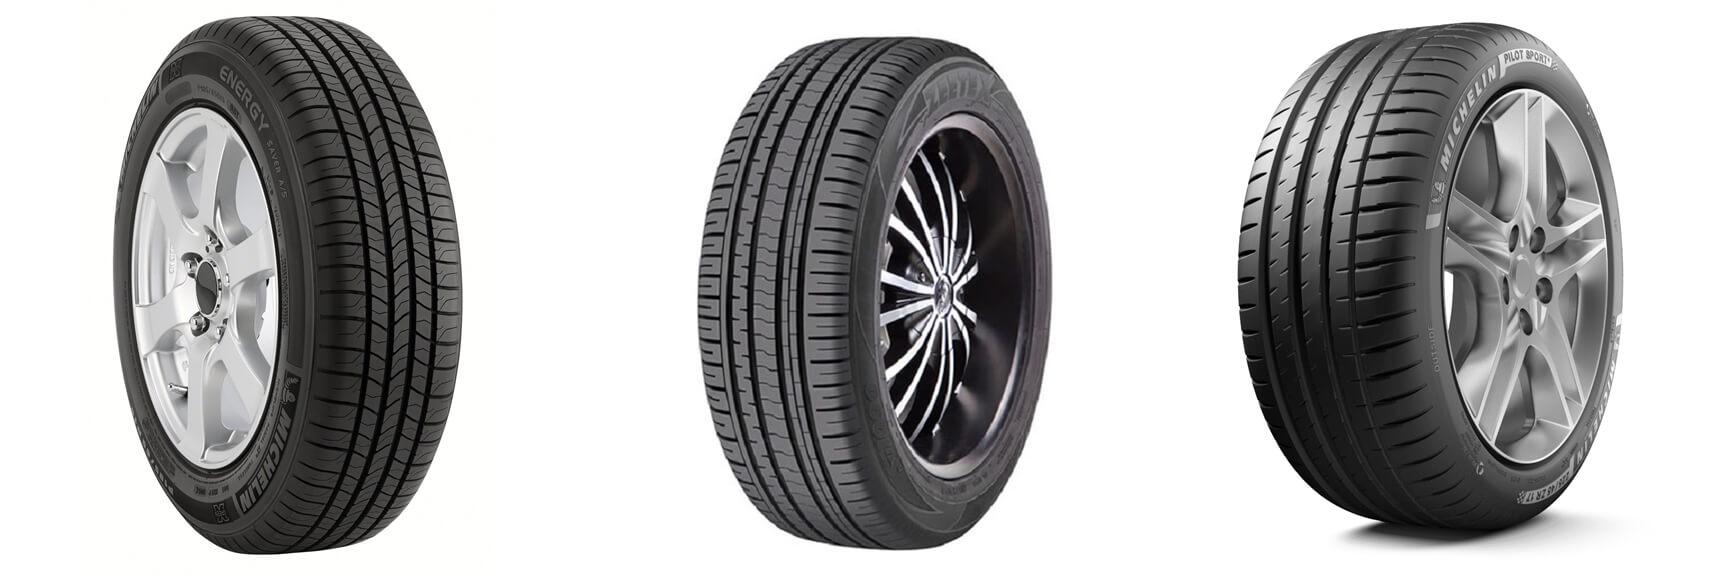 Harga Ban Mobil Michelin Ring 18